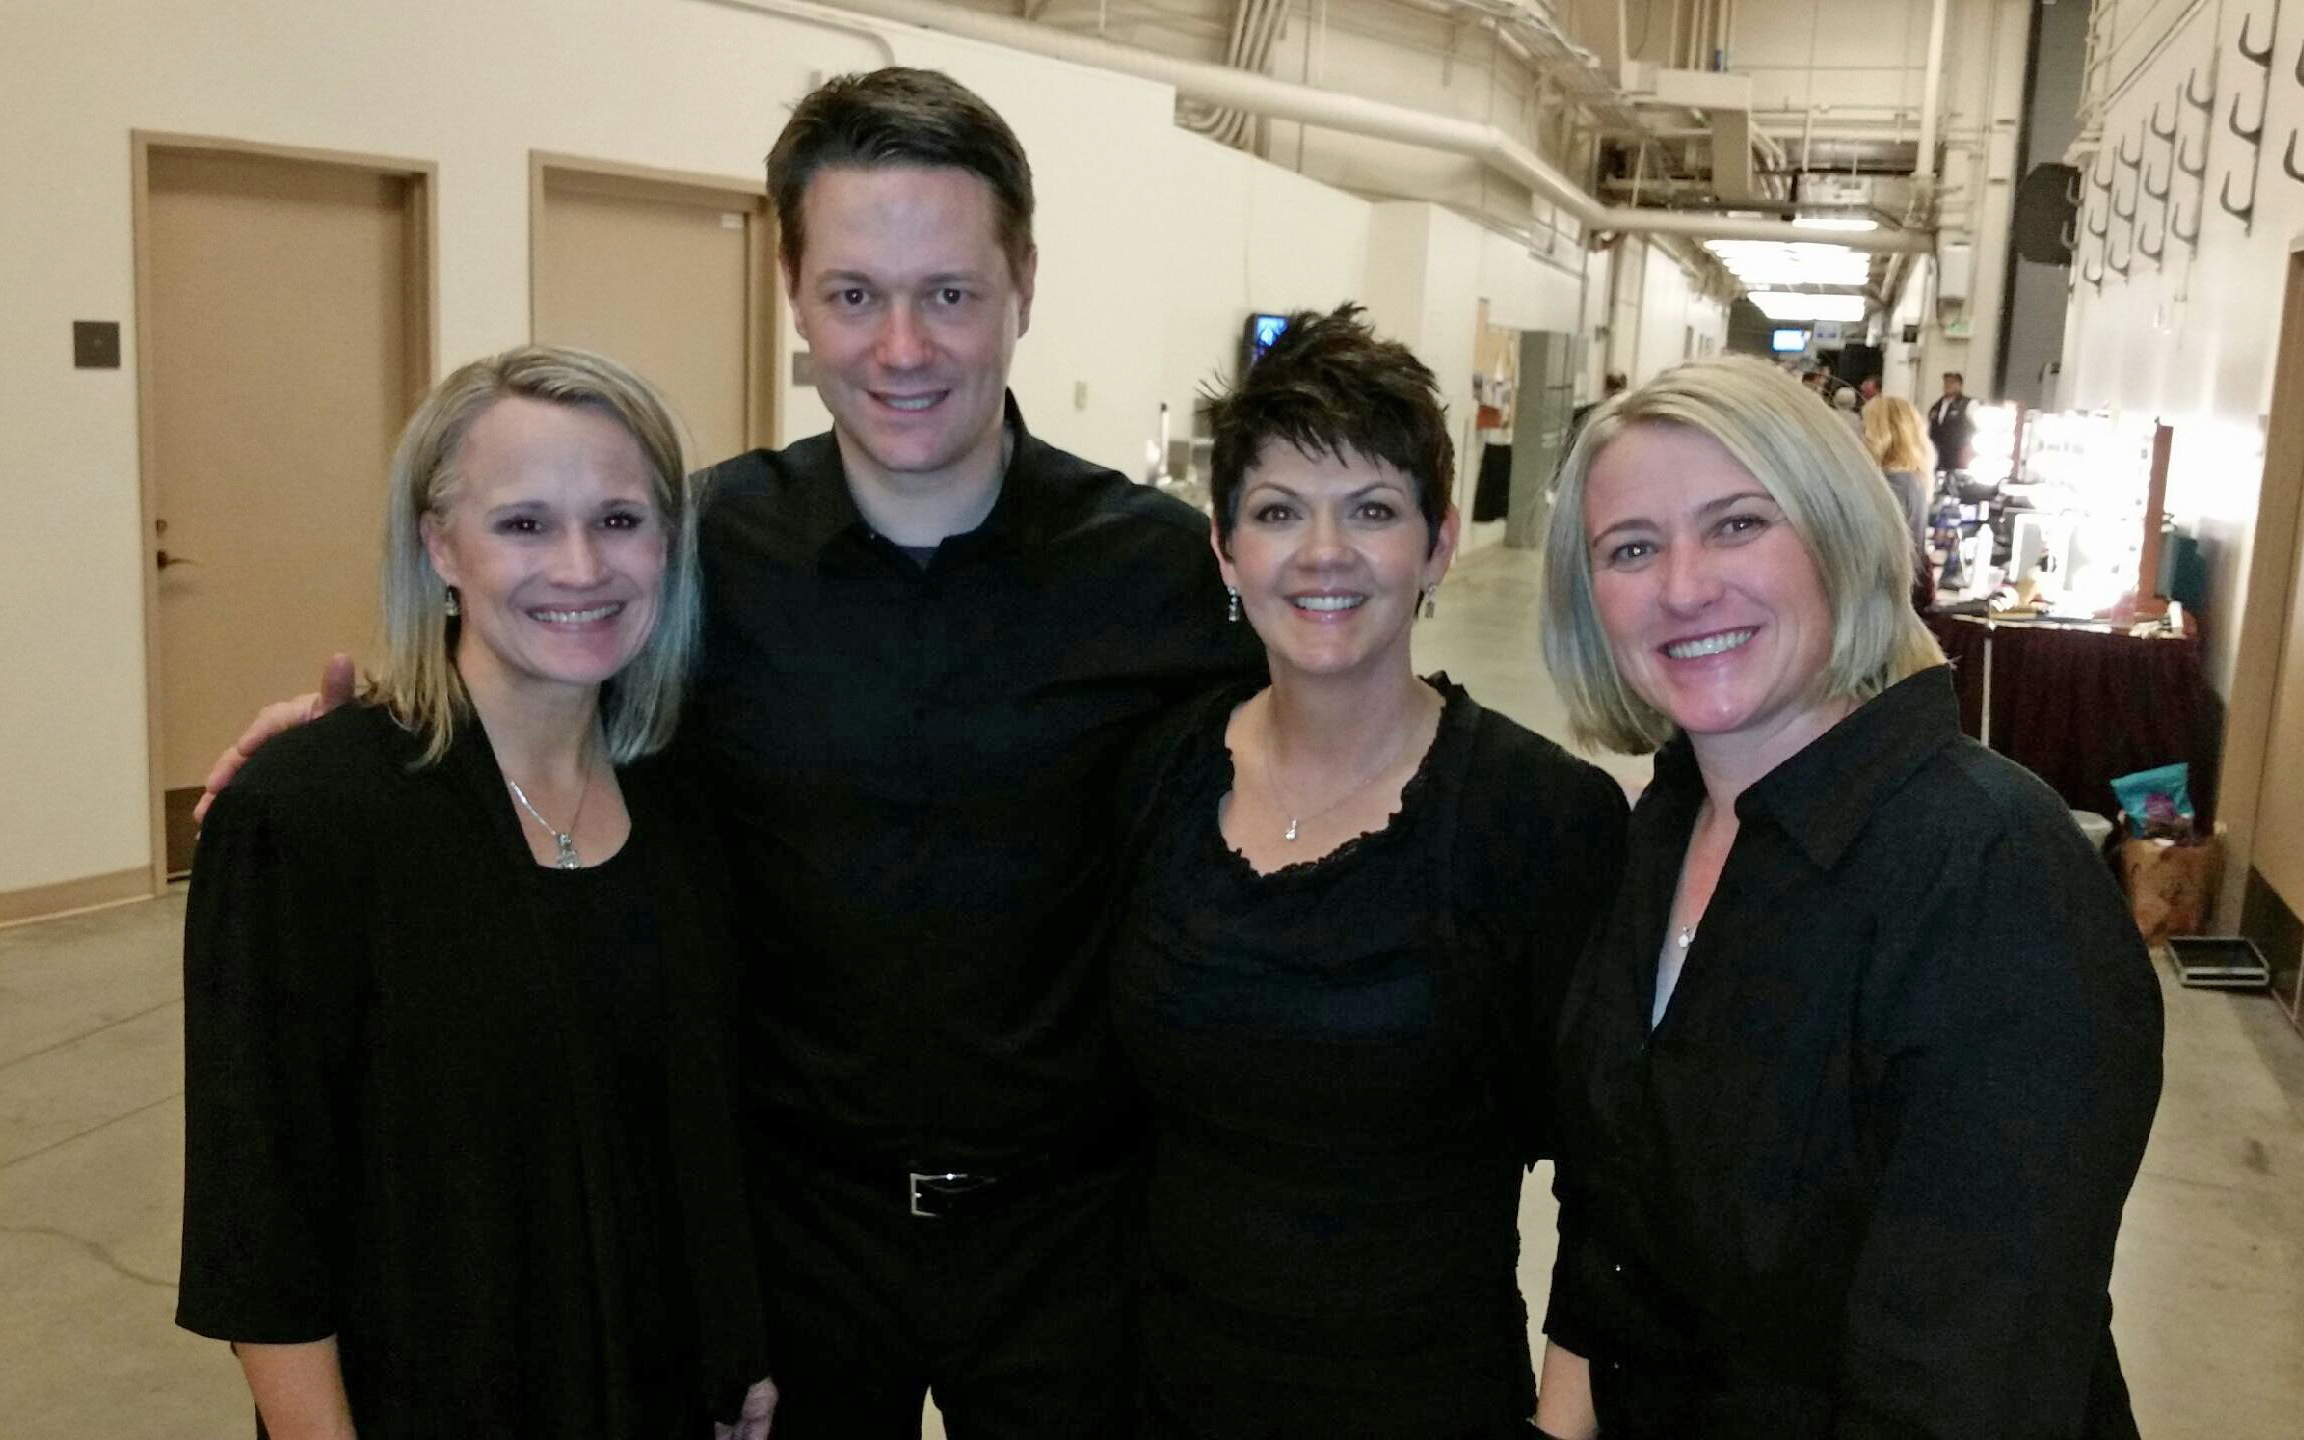 Christmas Concert Backstage - Jeannine Goeckeritz - Matt Vogel - Tiffany Sedgley - Lisa Whatcott.jpg